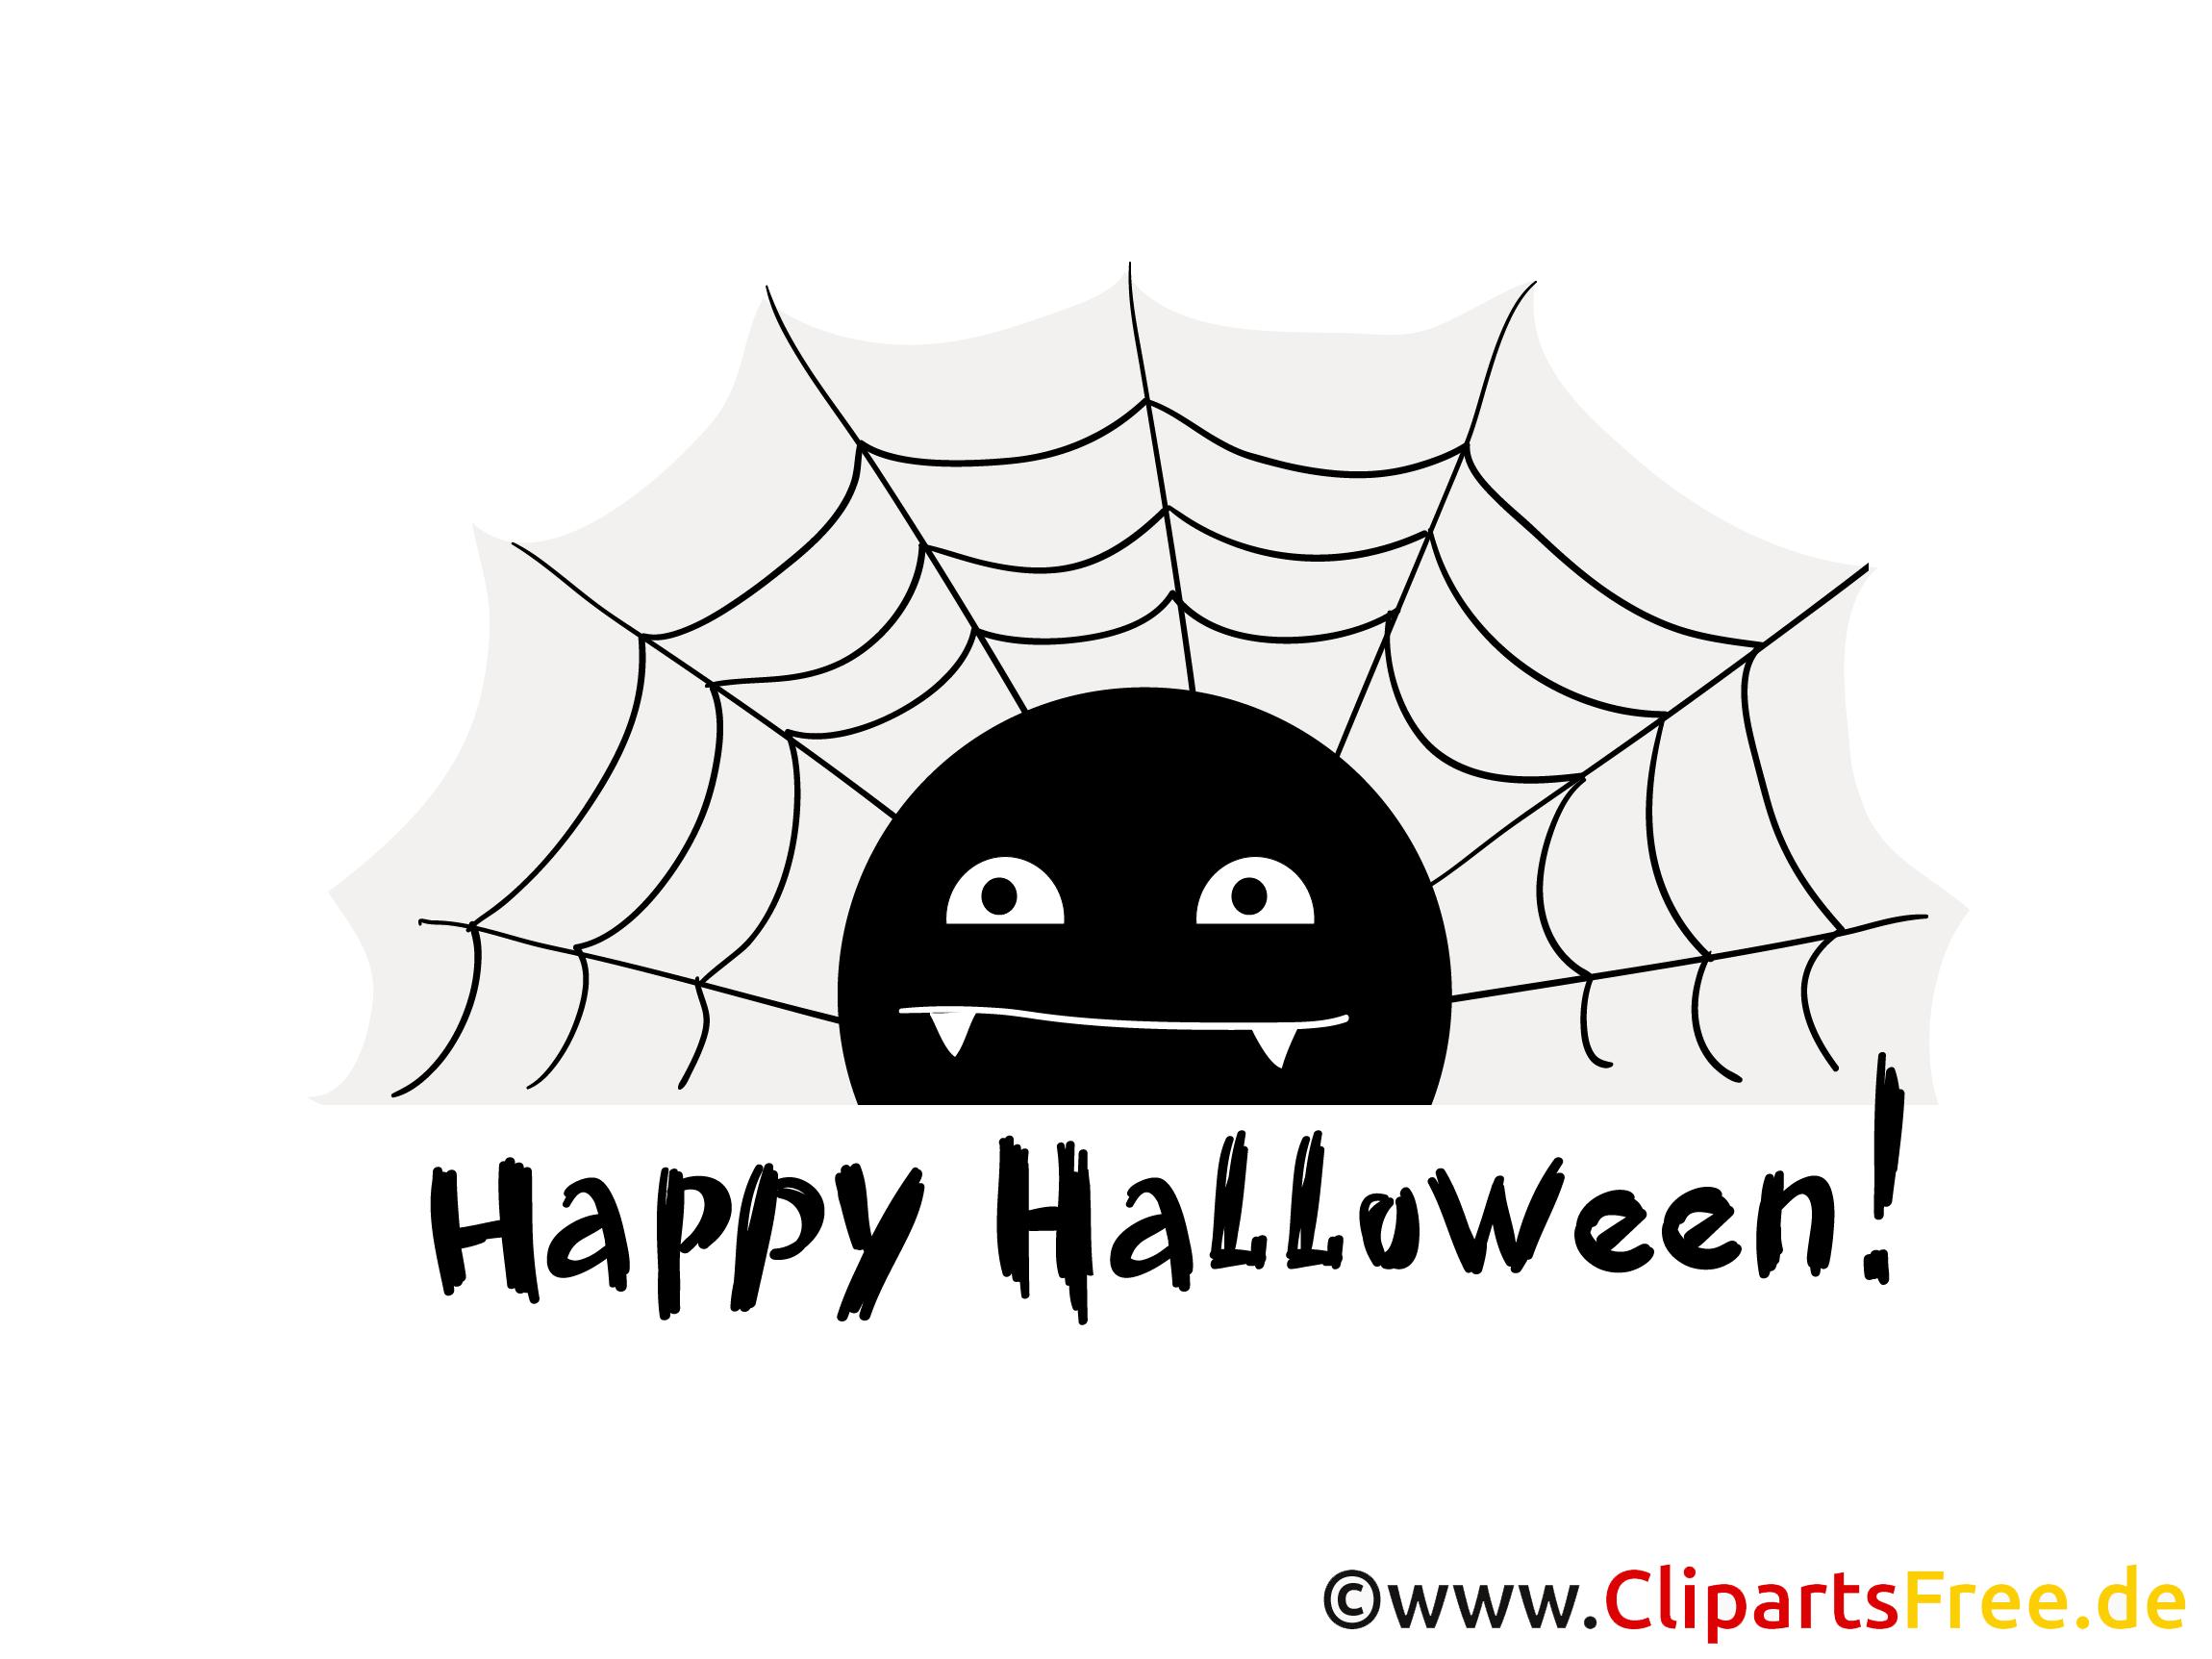 Spinnennetz Clipart, Bild, Cartoon zu Halloween